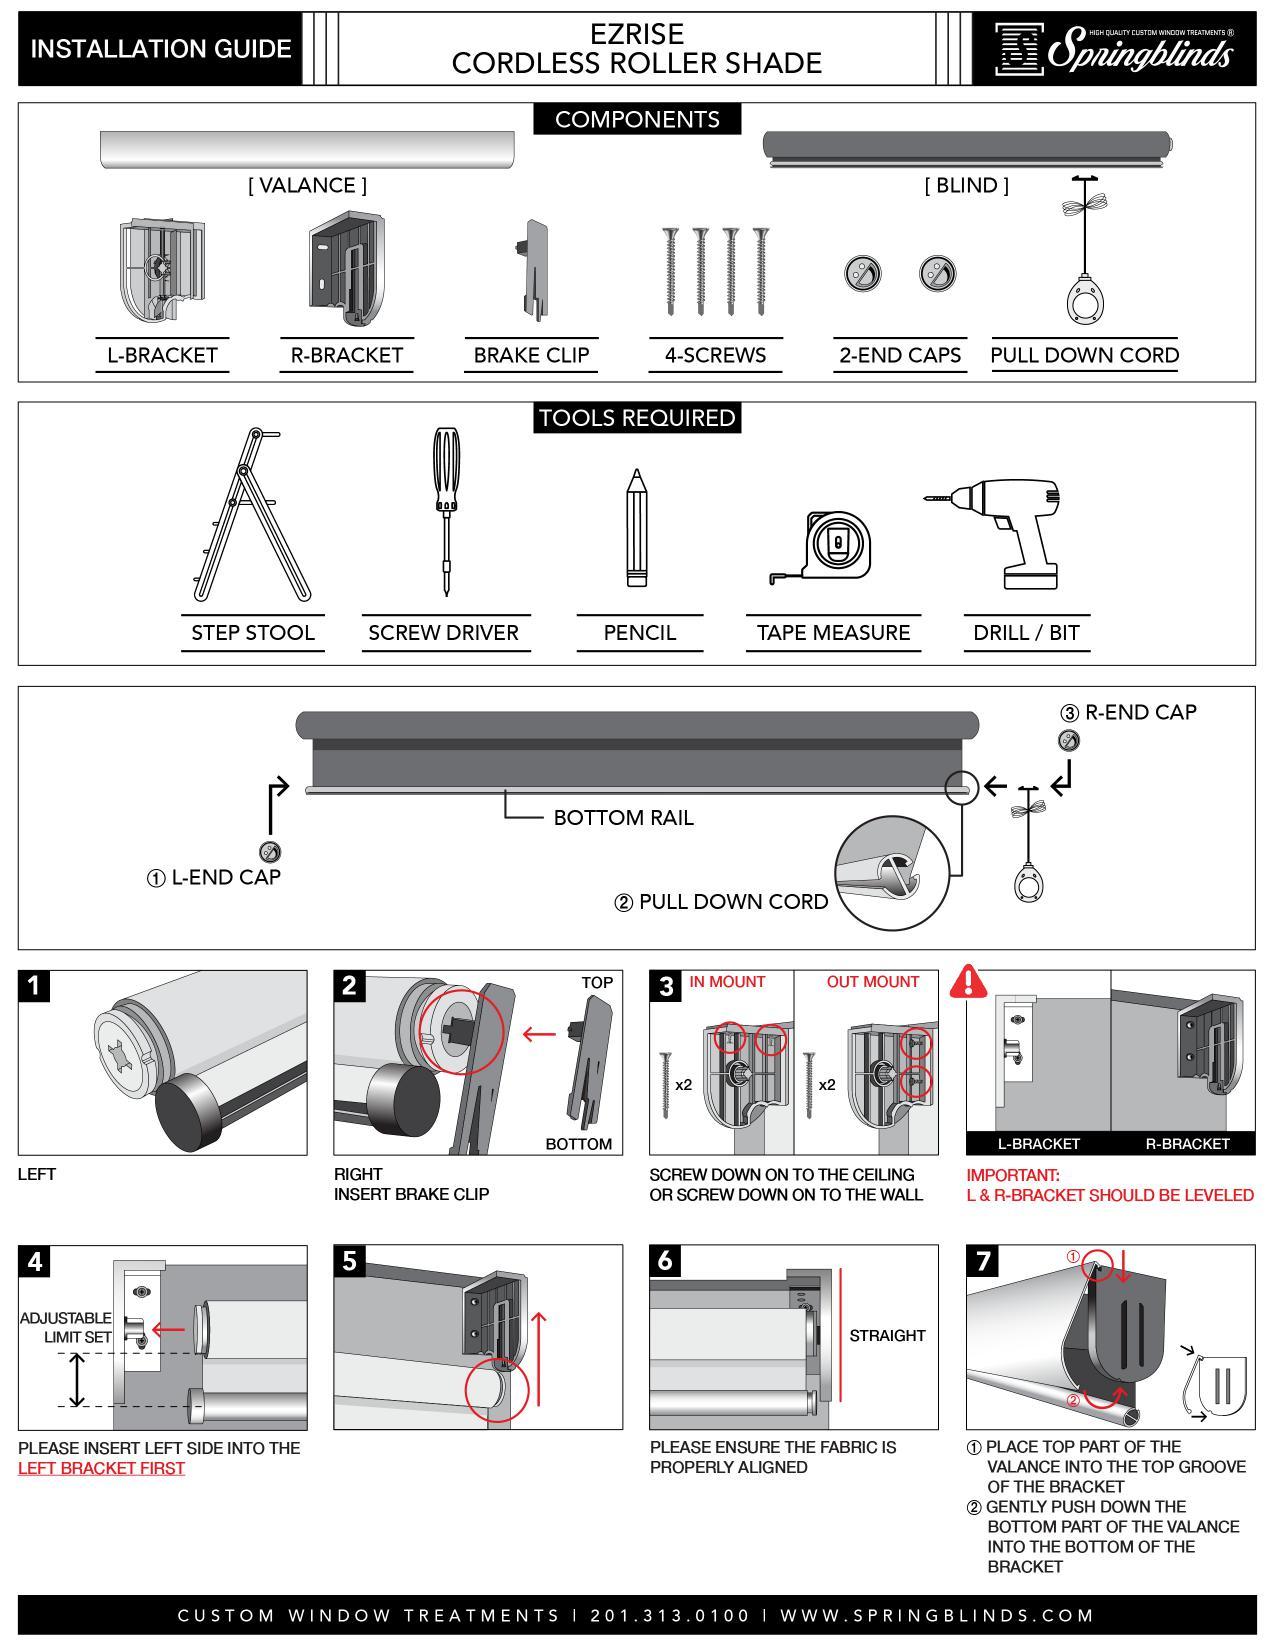 ezrise-cordless-roller-shade-installation-guide.jpg